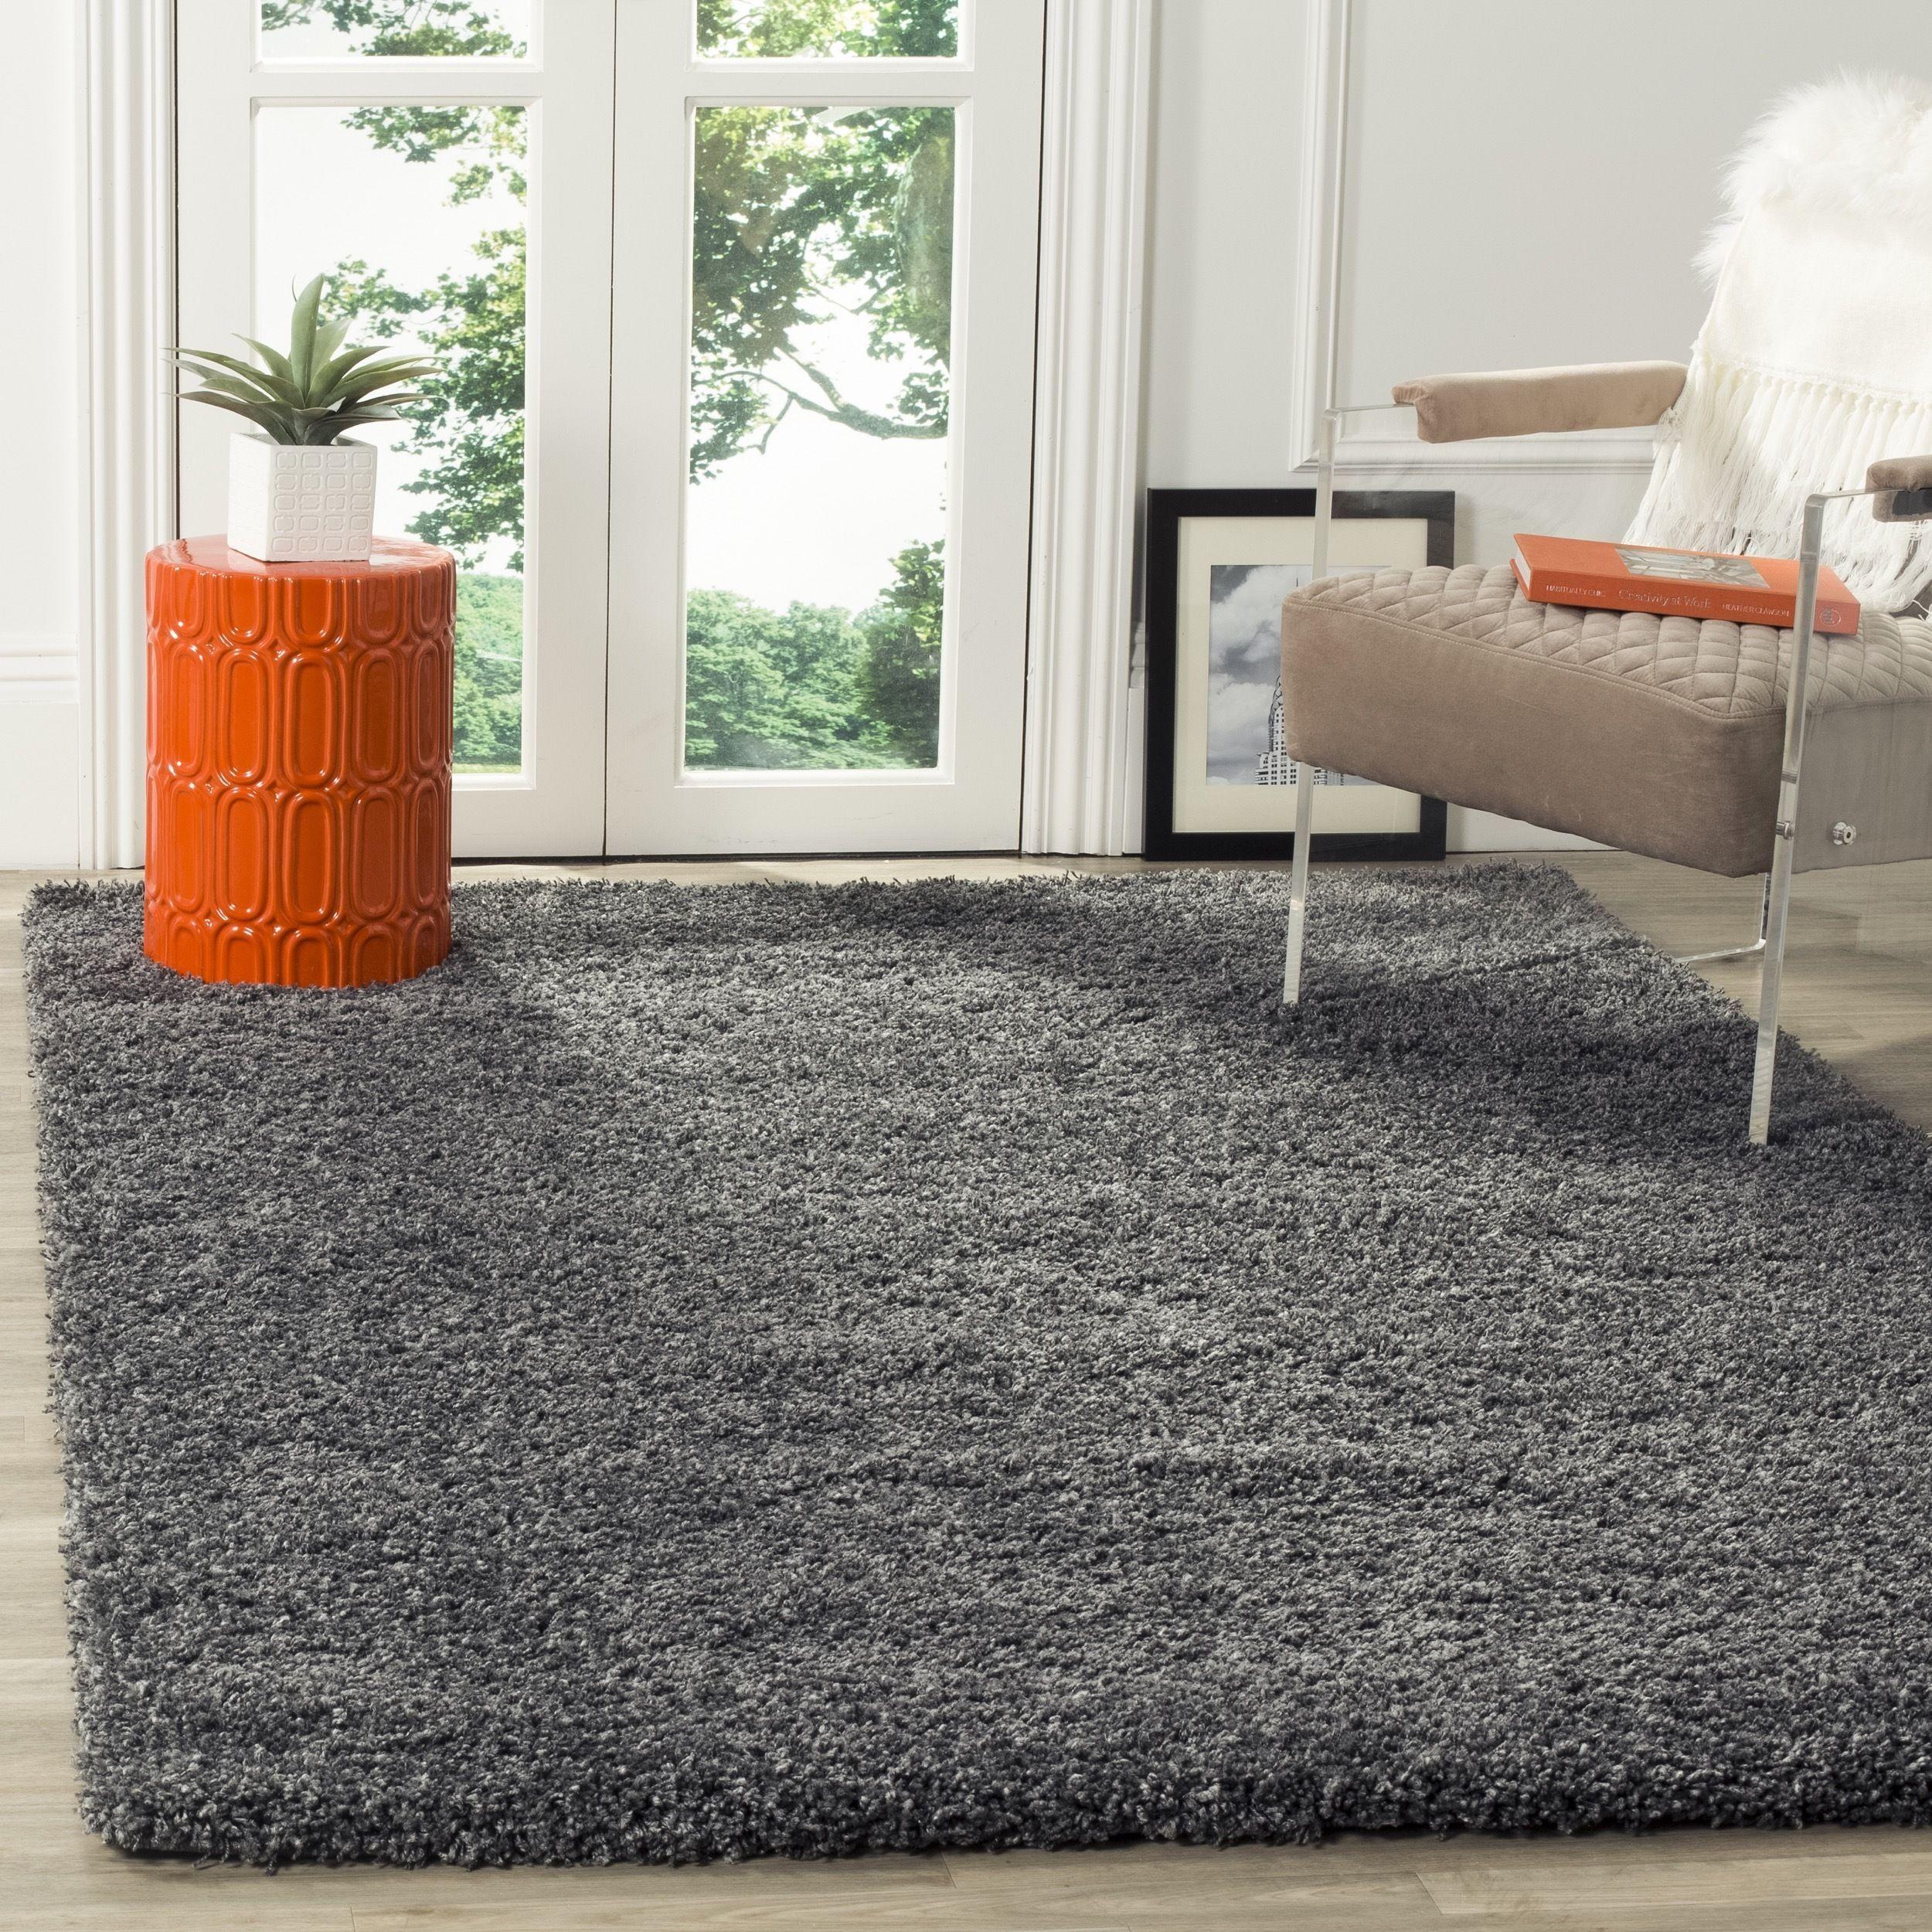 rug for living room size%0A Safavieh California Cozy Plush Dark Grey  Charcoal Shag Rug    u     Square